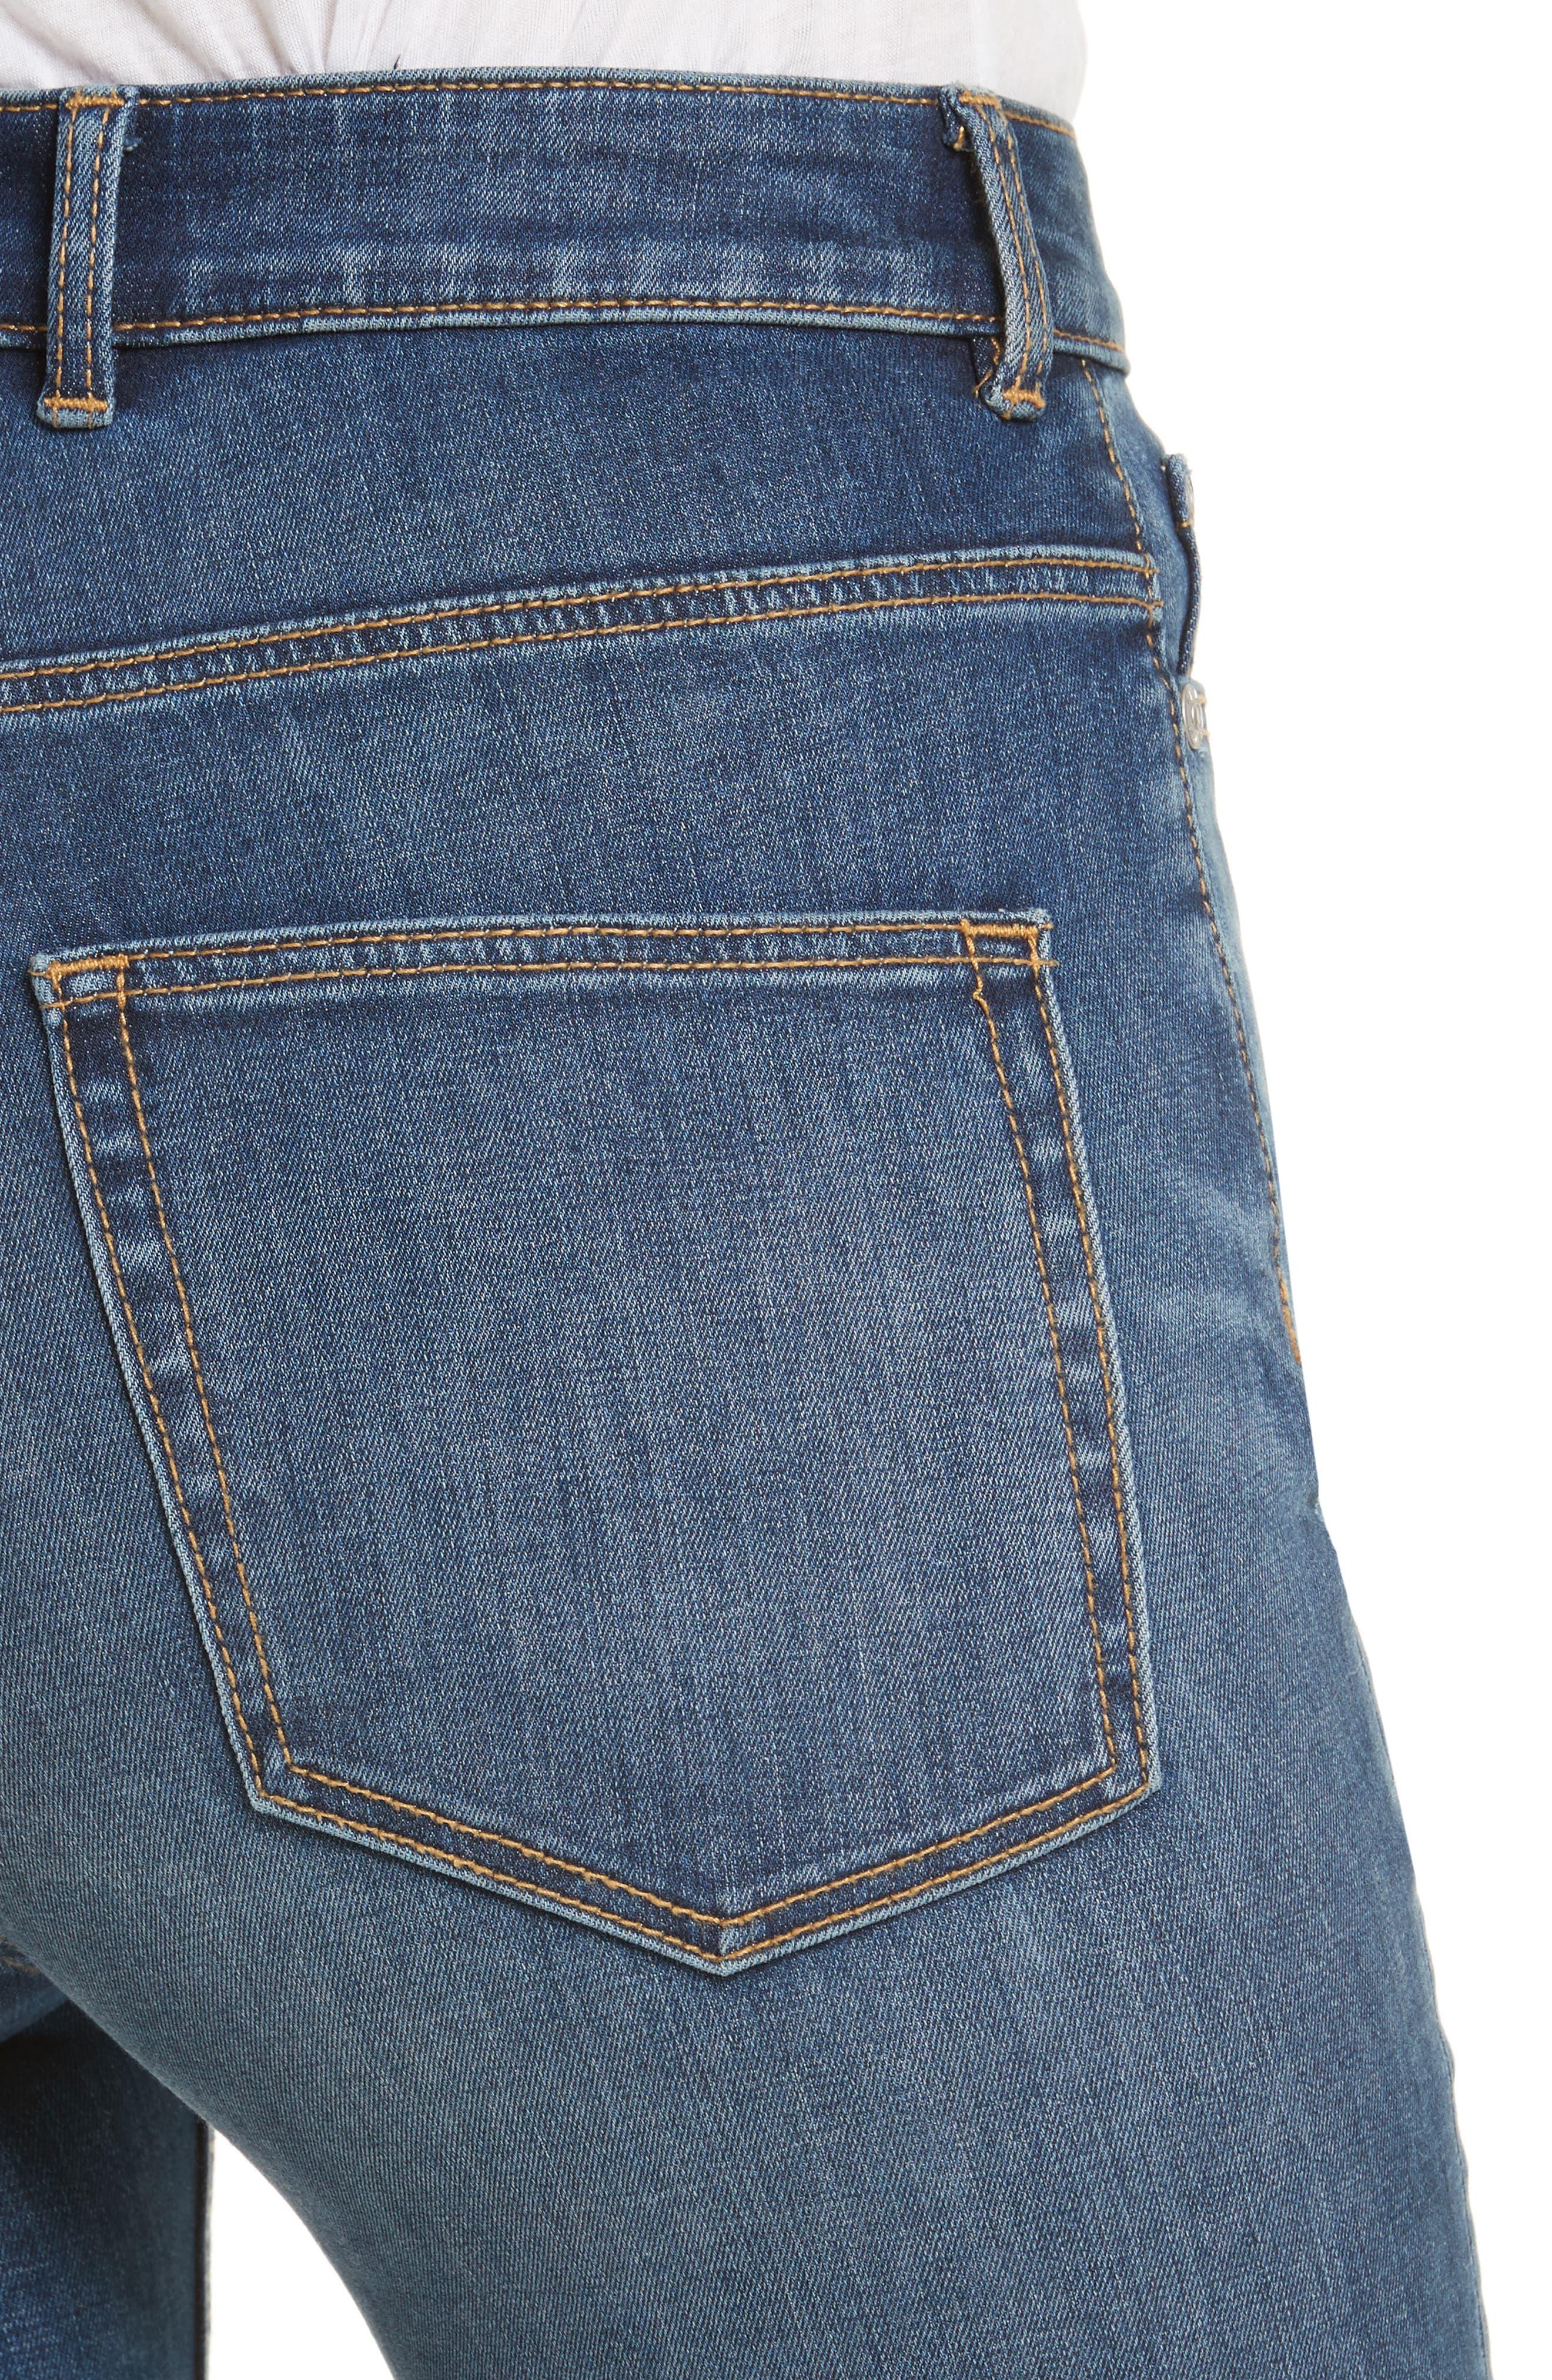 Clemence Skinny Jeans,                             Alternate thumbnail 4, color,                             401